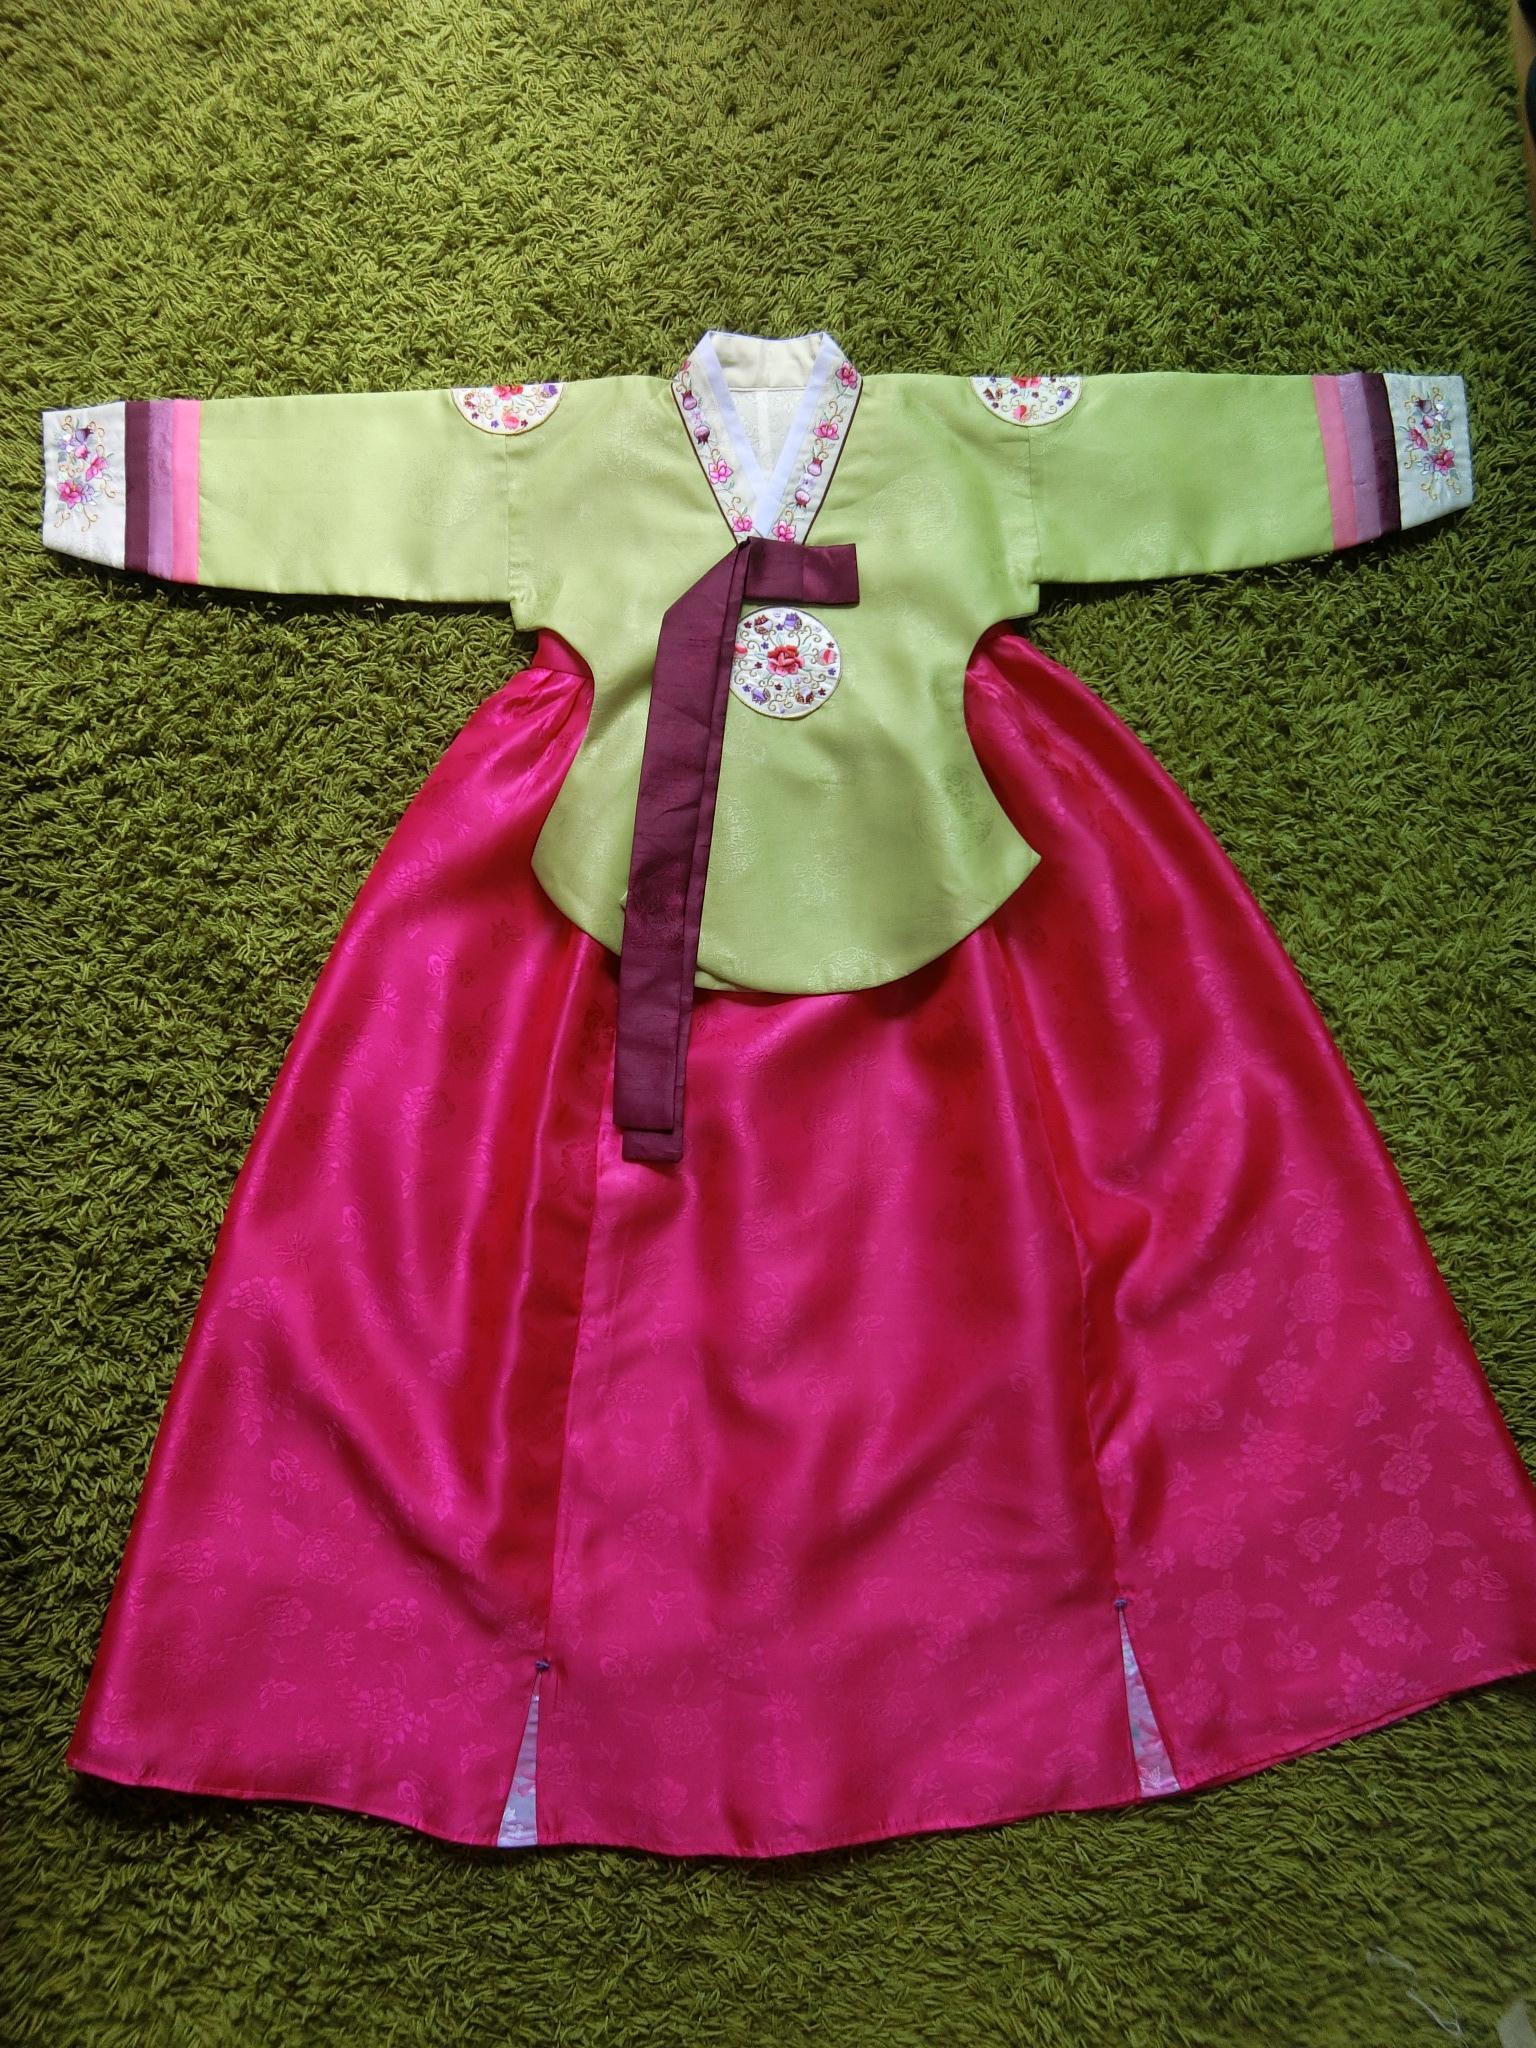 Hanbok Girl ฮันบกผ้าไหมชาววังงานพรีเมี่ยม สำหรับเด็ก 10 ขวบ